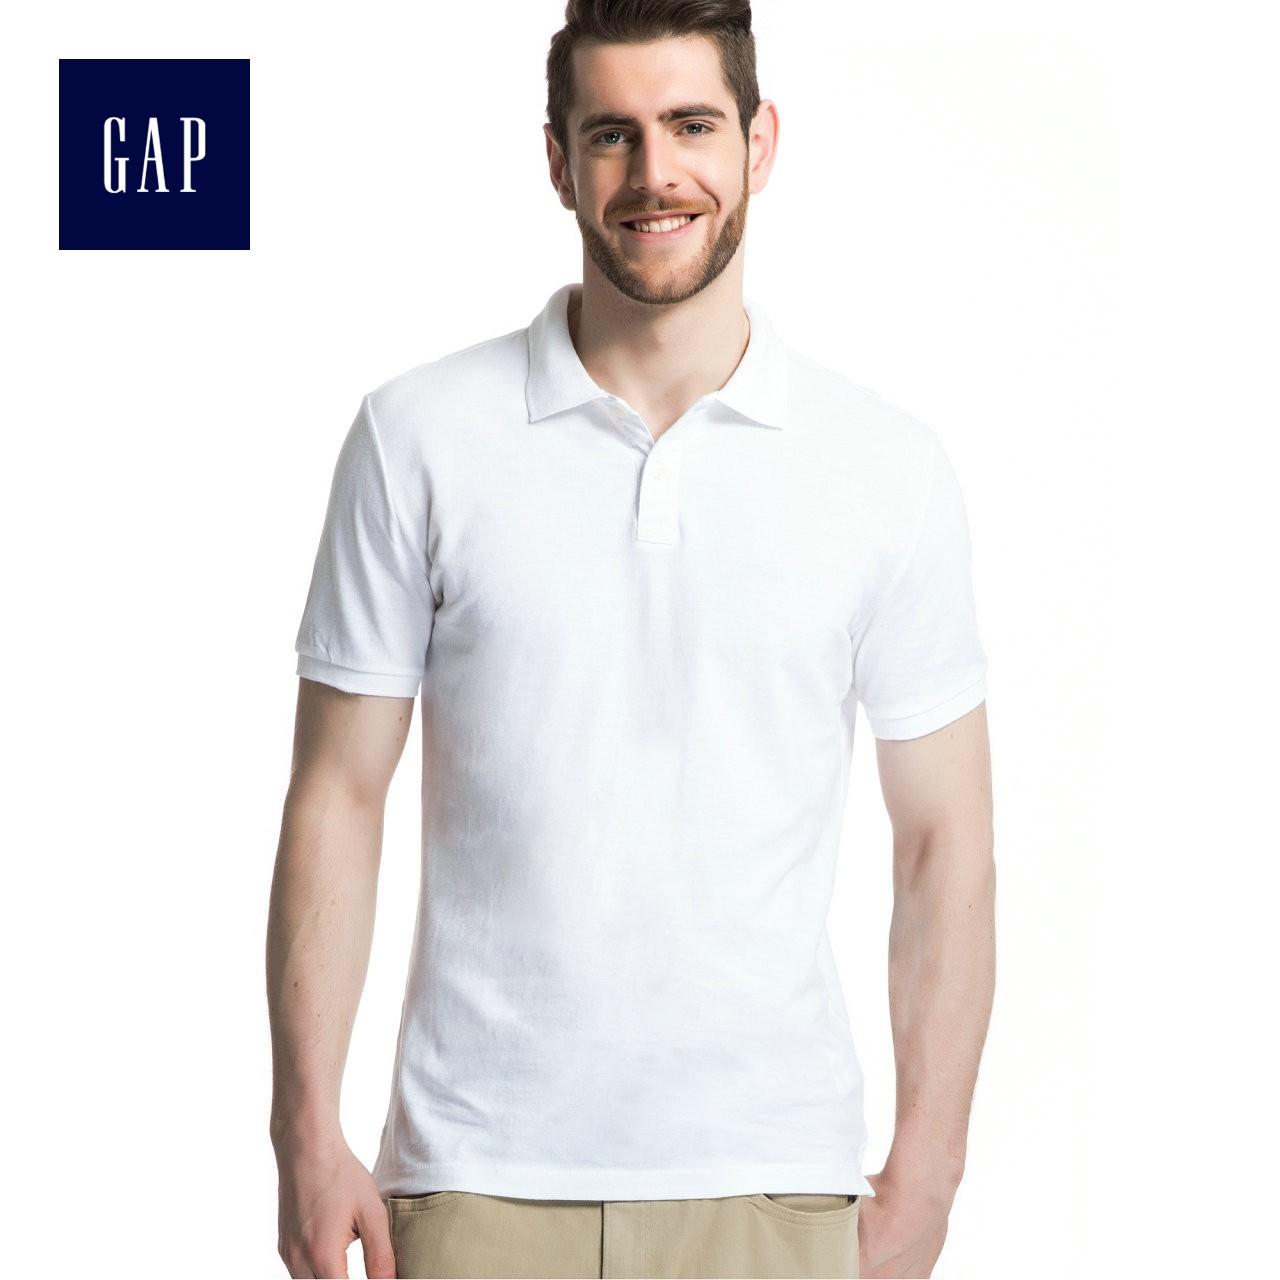 Gap男装 纯棉纯色两粒扣开襟Polo衫 针织内搭上衣520251-1